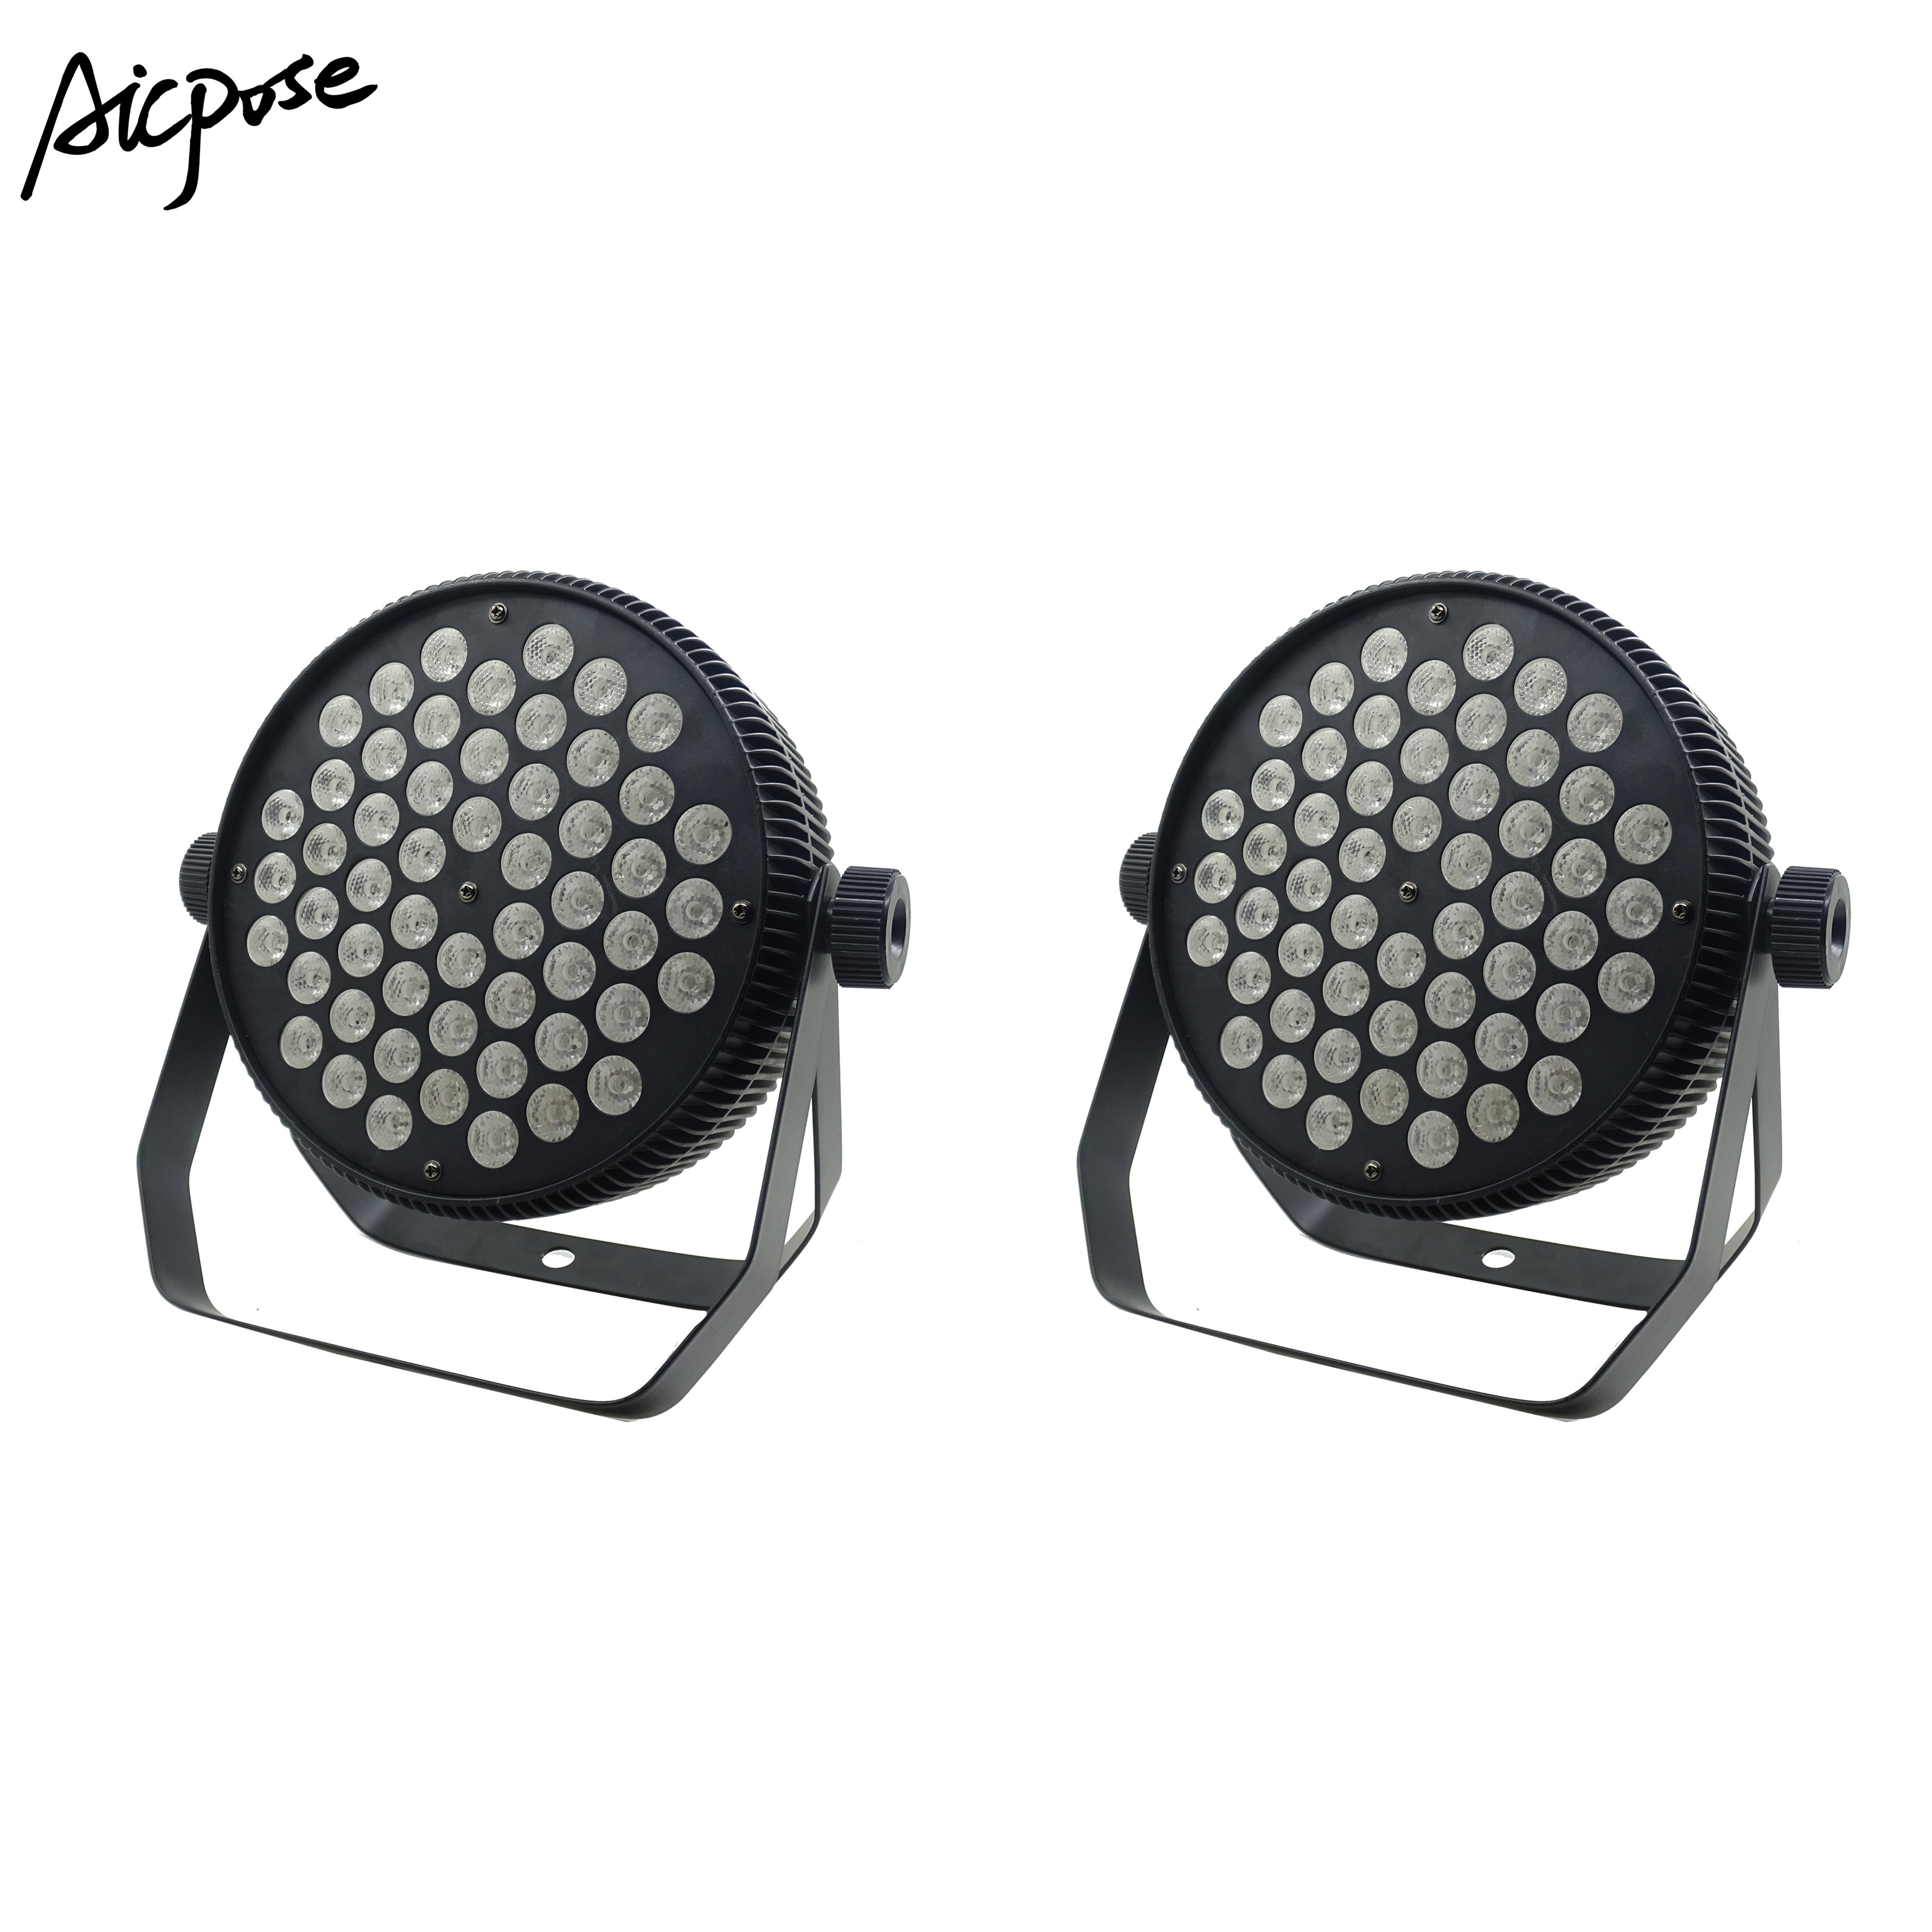 2pcs/lots Aluminum Flat LED Par 54x3W RGB 3 in 1 LED Par Can Light spotlight DJ Disco Projector Wall washer stage lighting title=